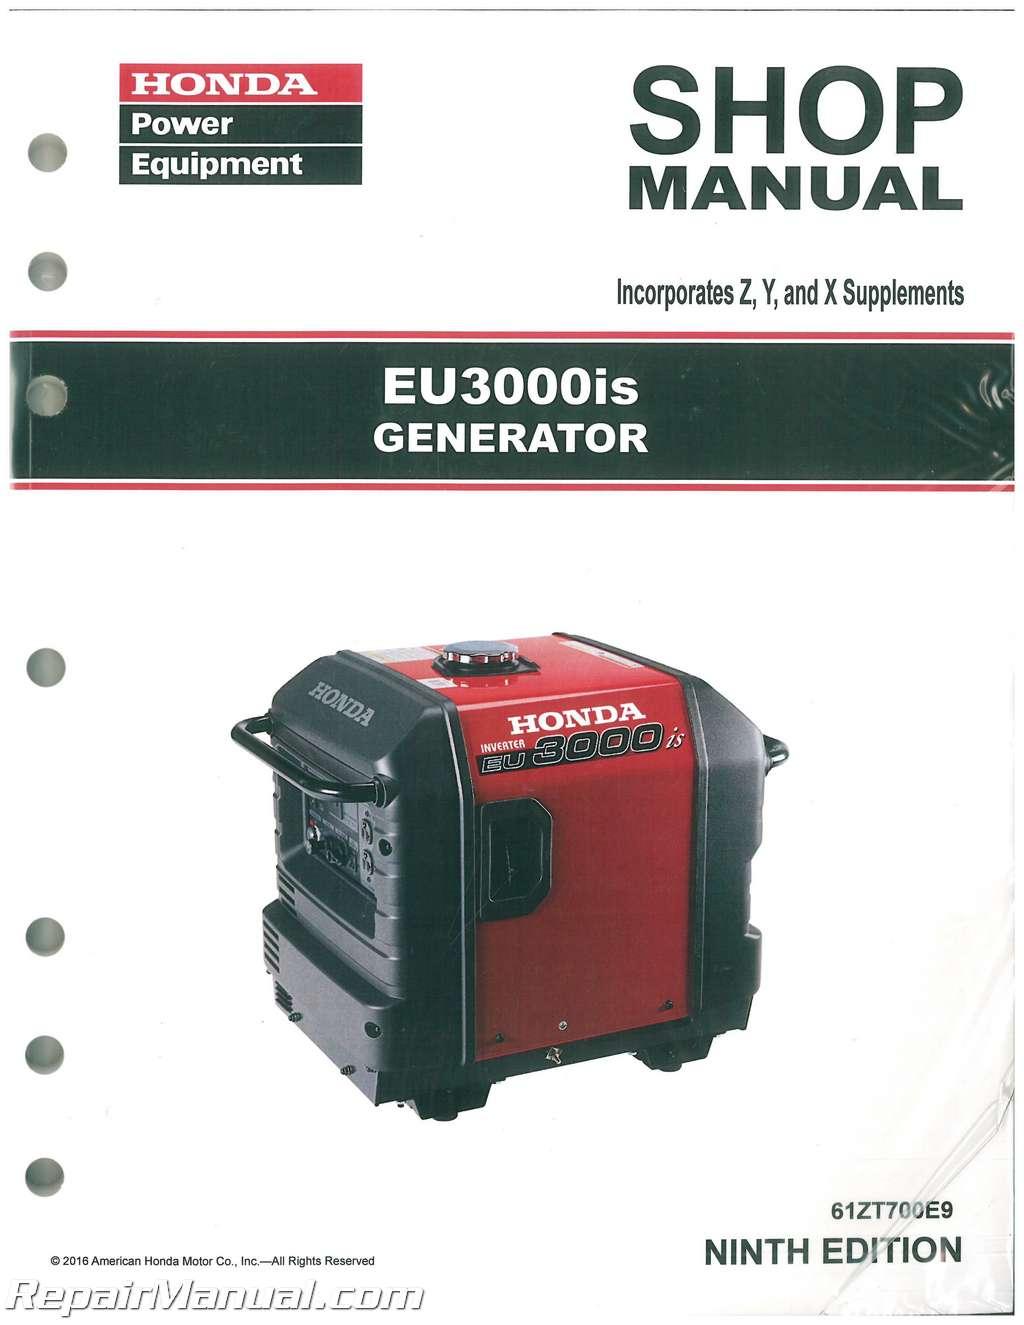 hight resolution of honda eu3000is generator shop manual